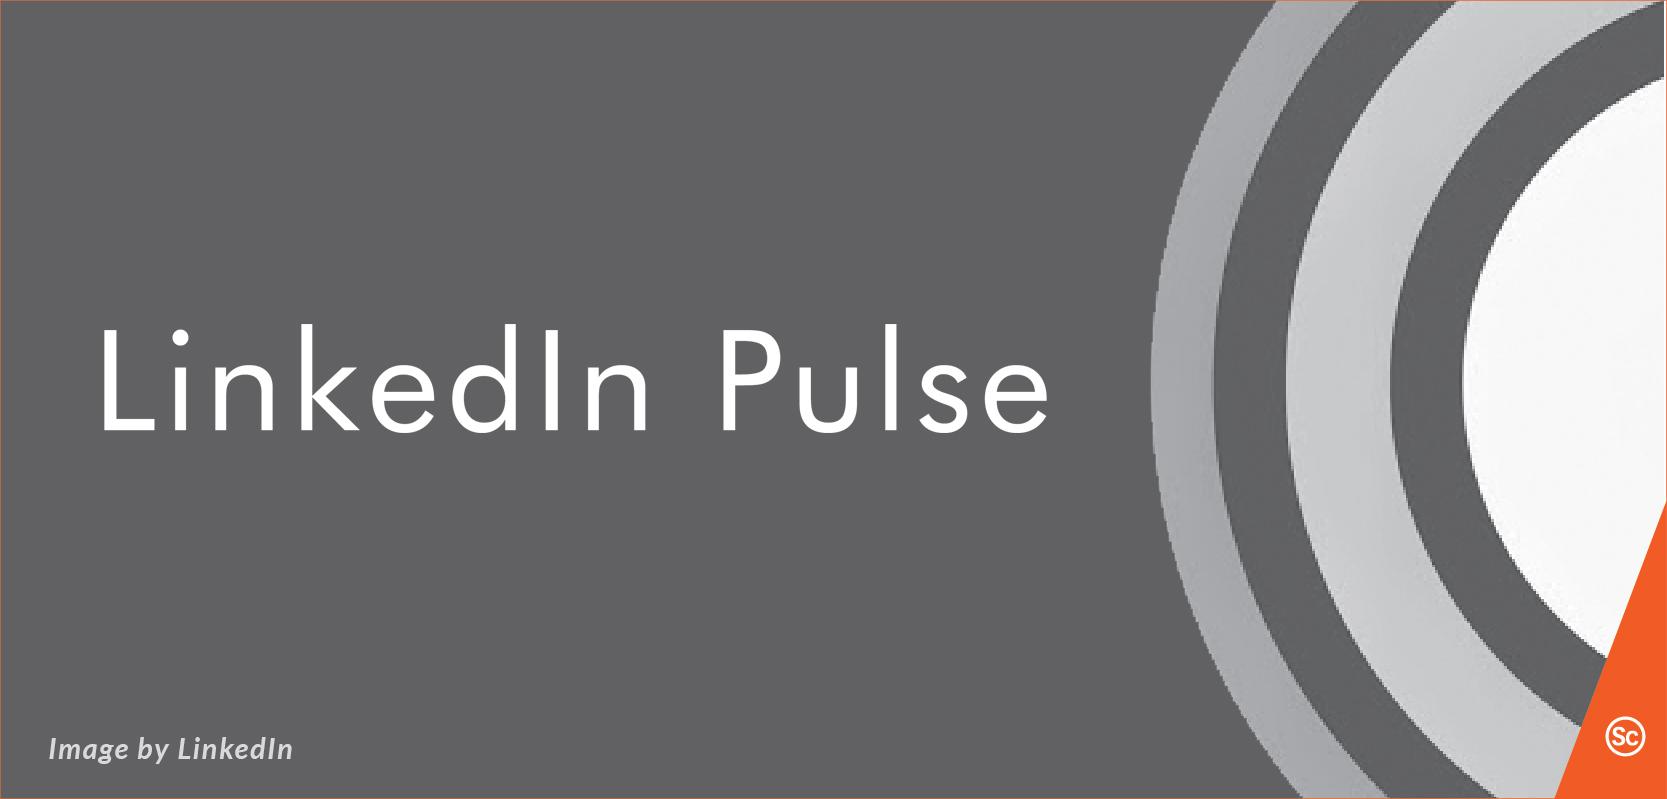 How do I use Pulse as part of my LinkedIn Social Media Strategy?